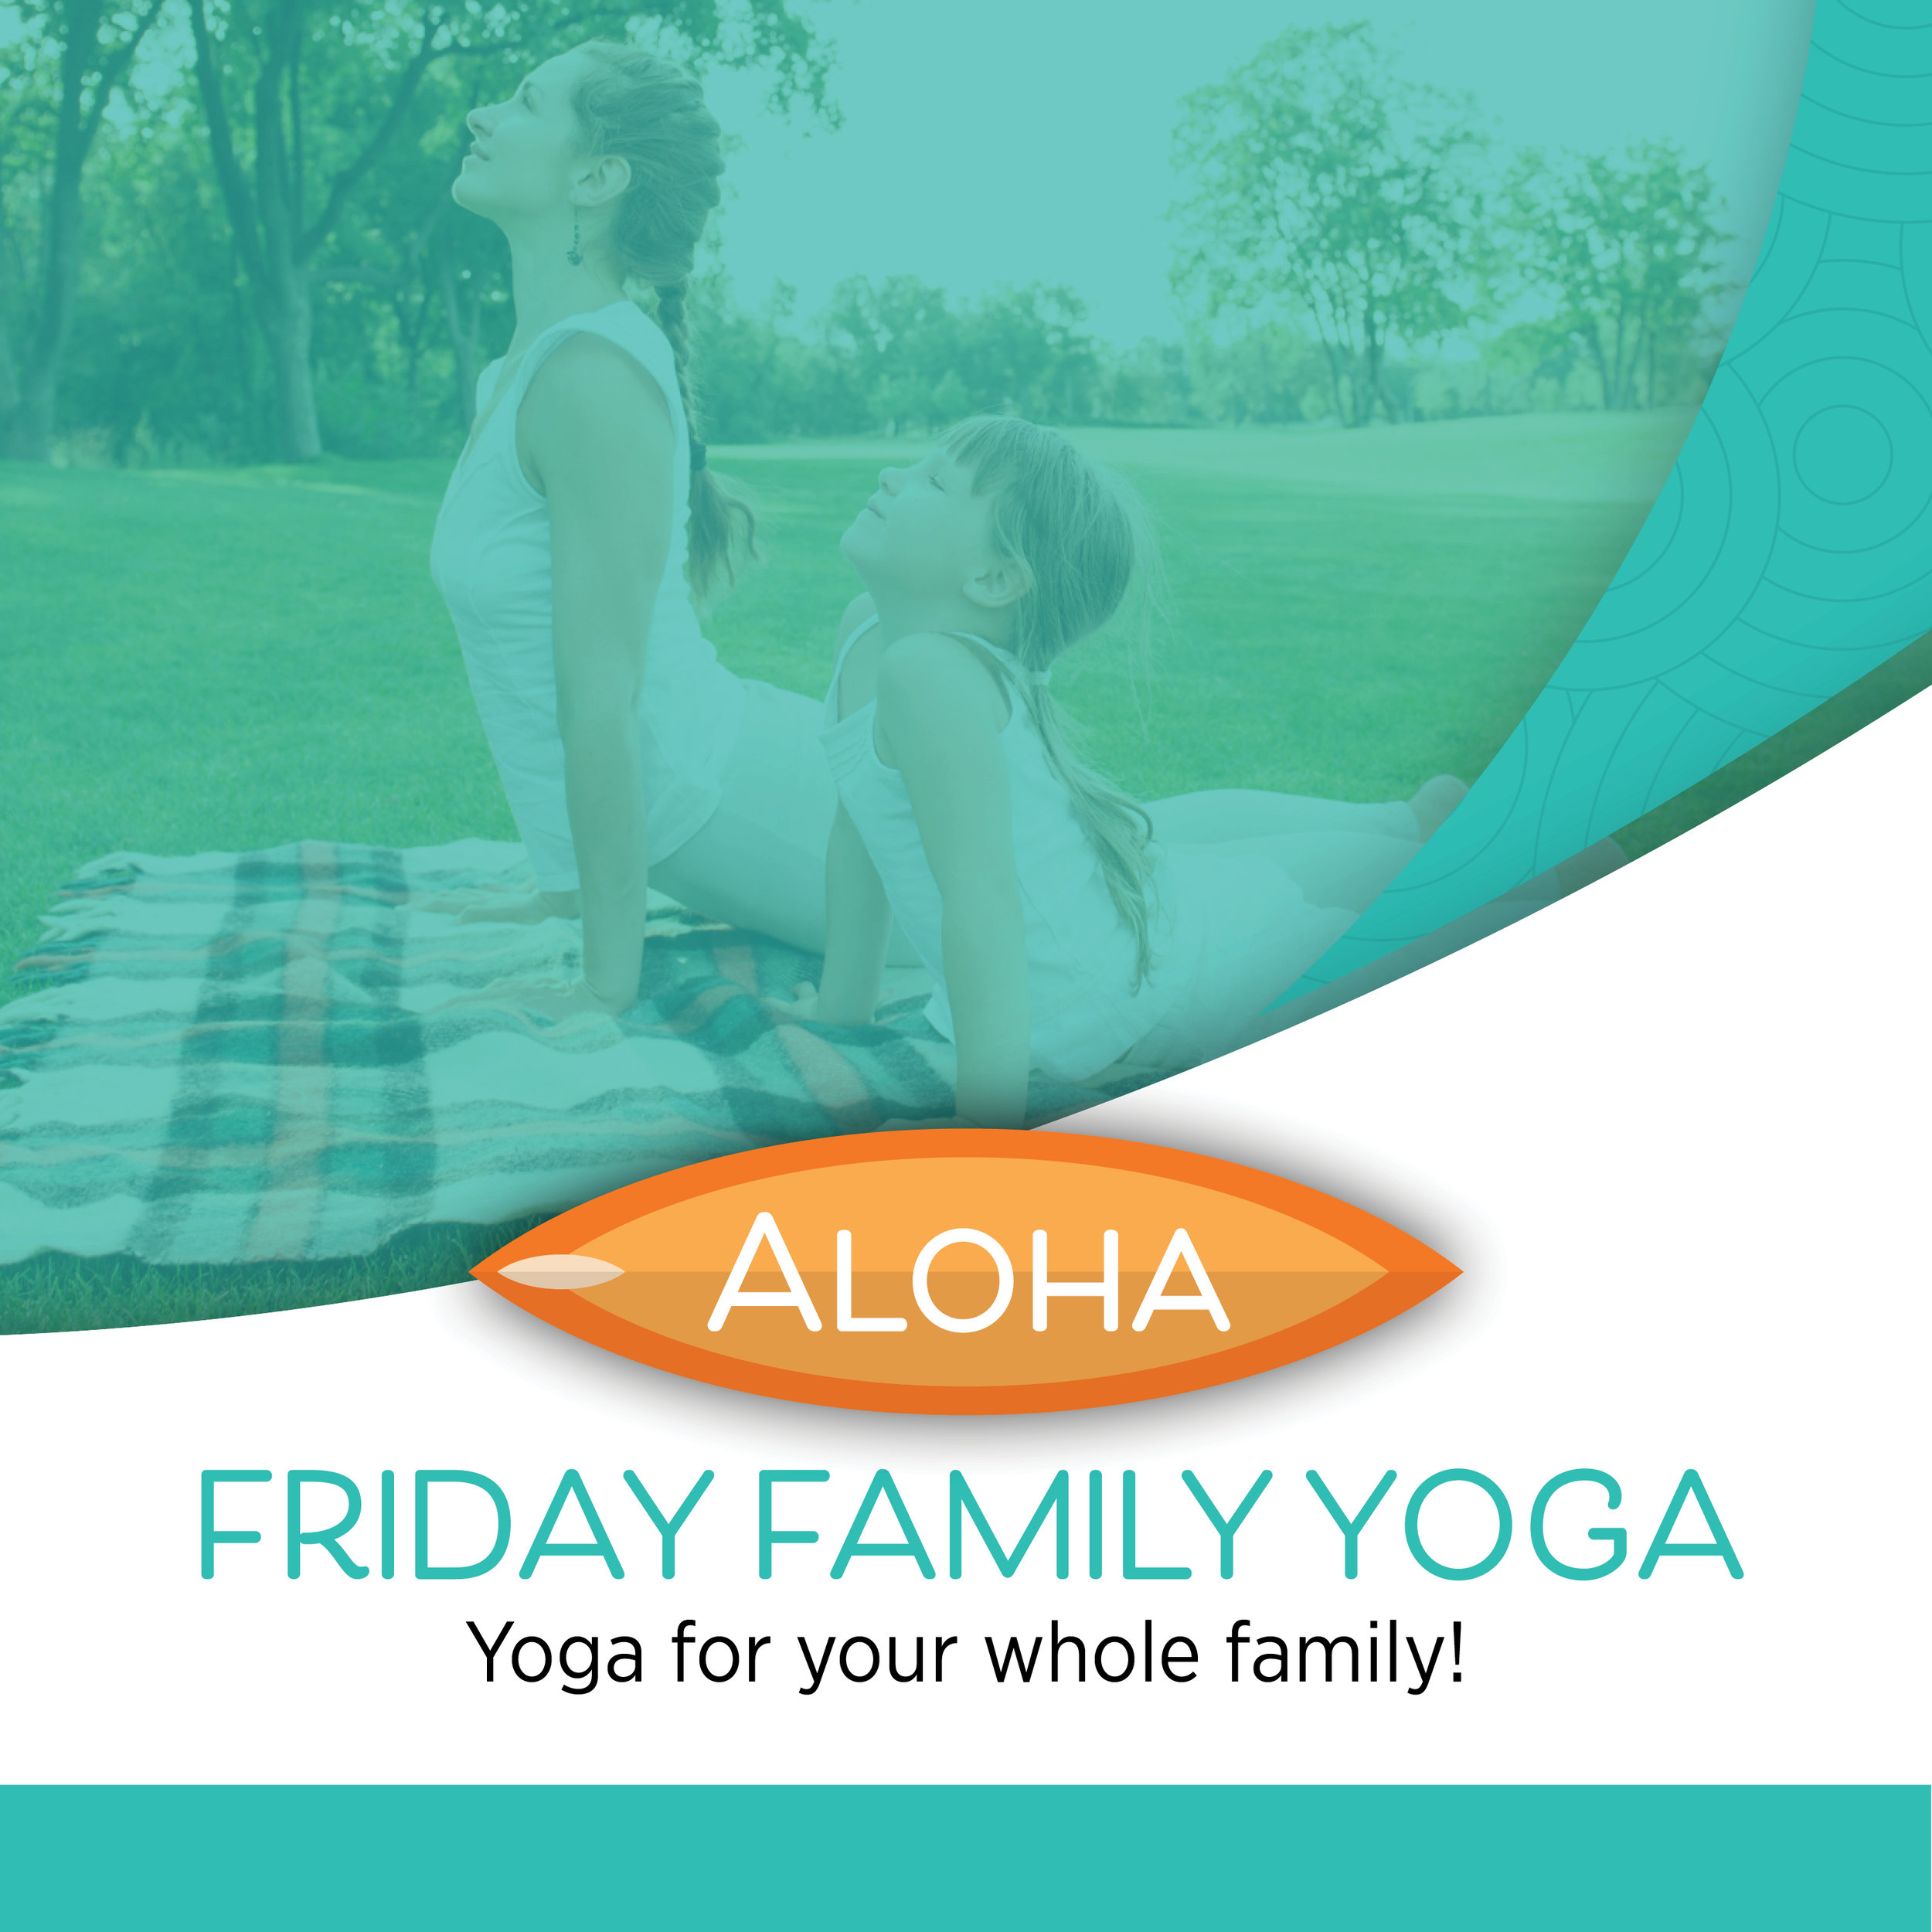 Haumea_2019_Event_Aloha Friday Family Yoga_Web.jpg